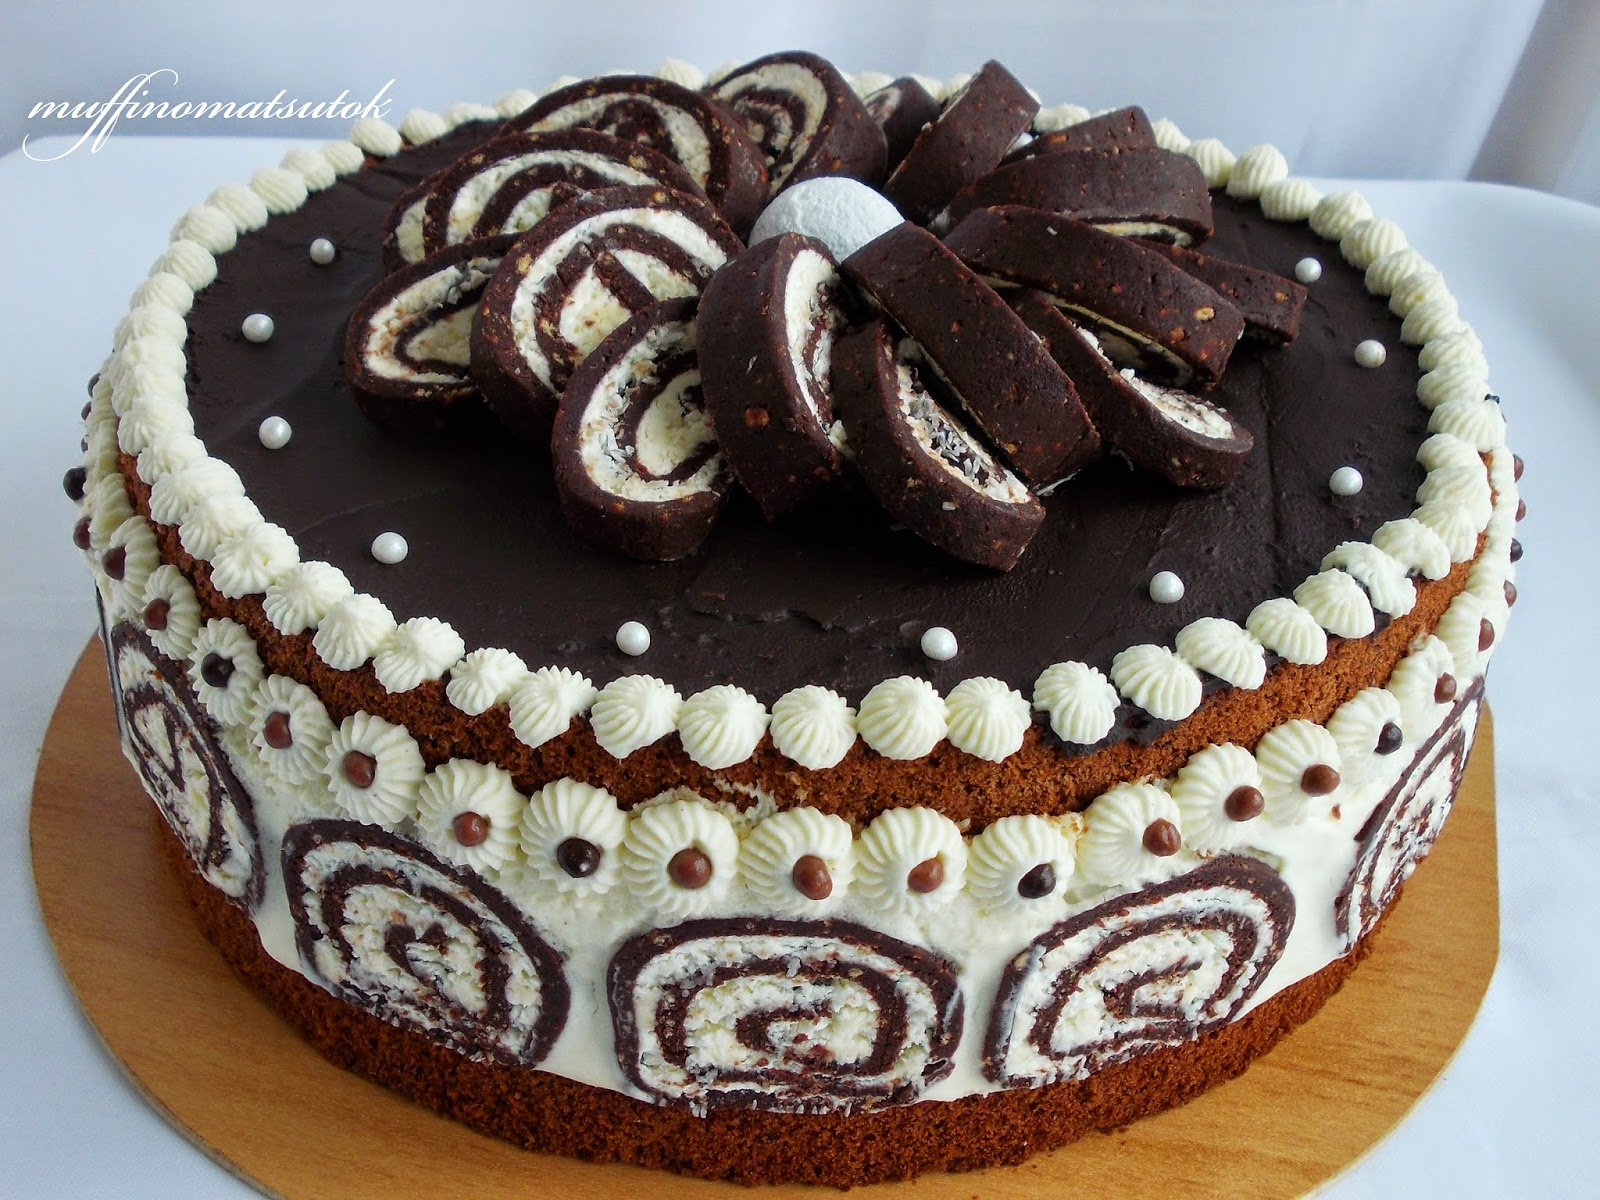 boldog szülinapot torták muffinomatsutok boldog szülinapot torták